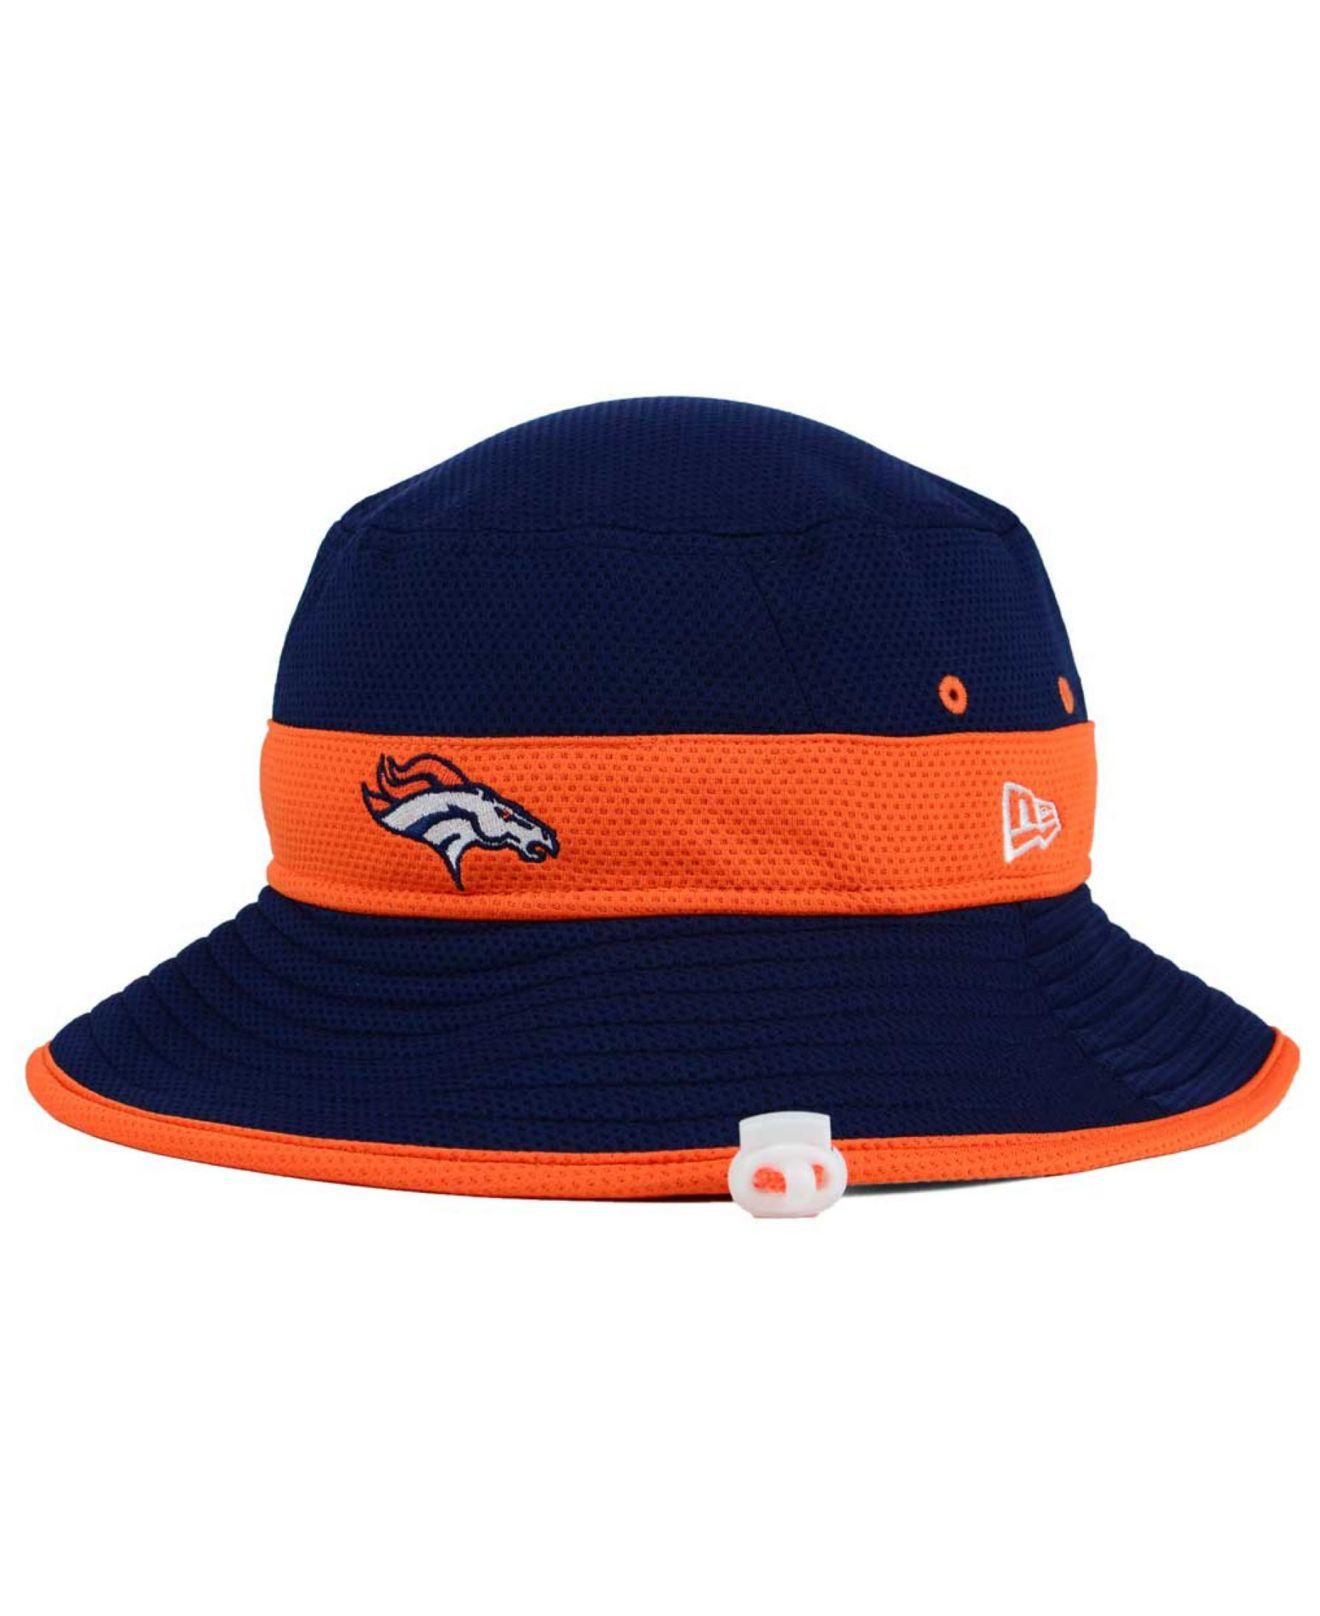 Lyst - KTZ Denver Broncos Training Camp Reverse Bucket Hat in Blue ... 421e9053c